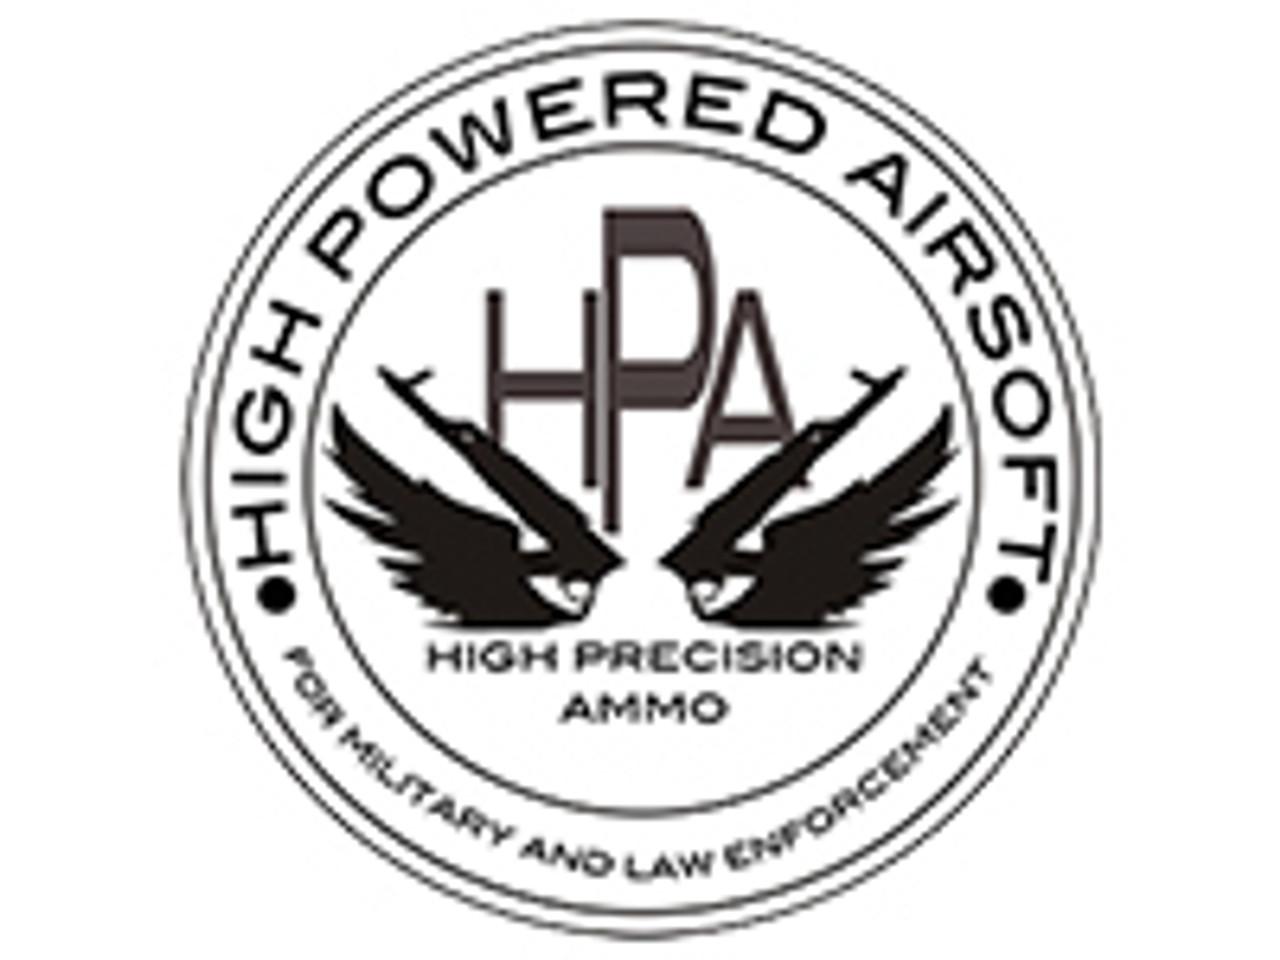 High Powered Airsoft